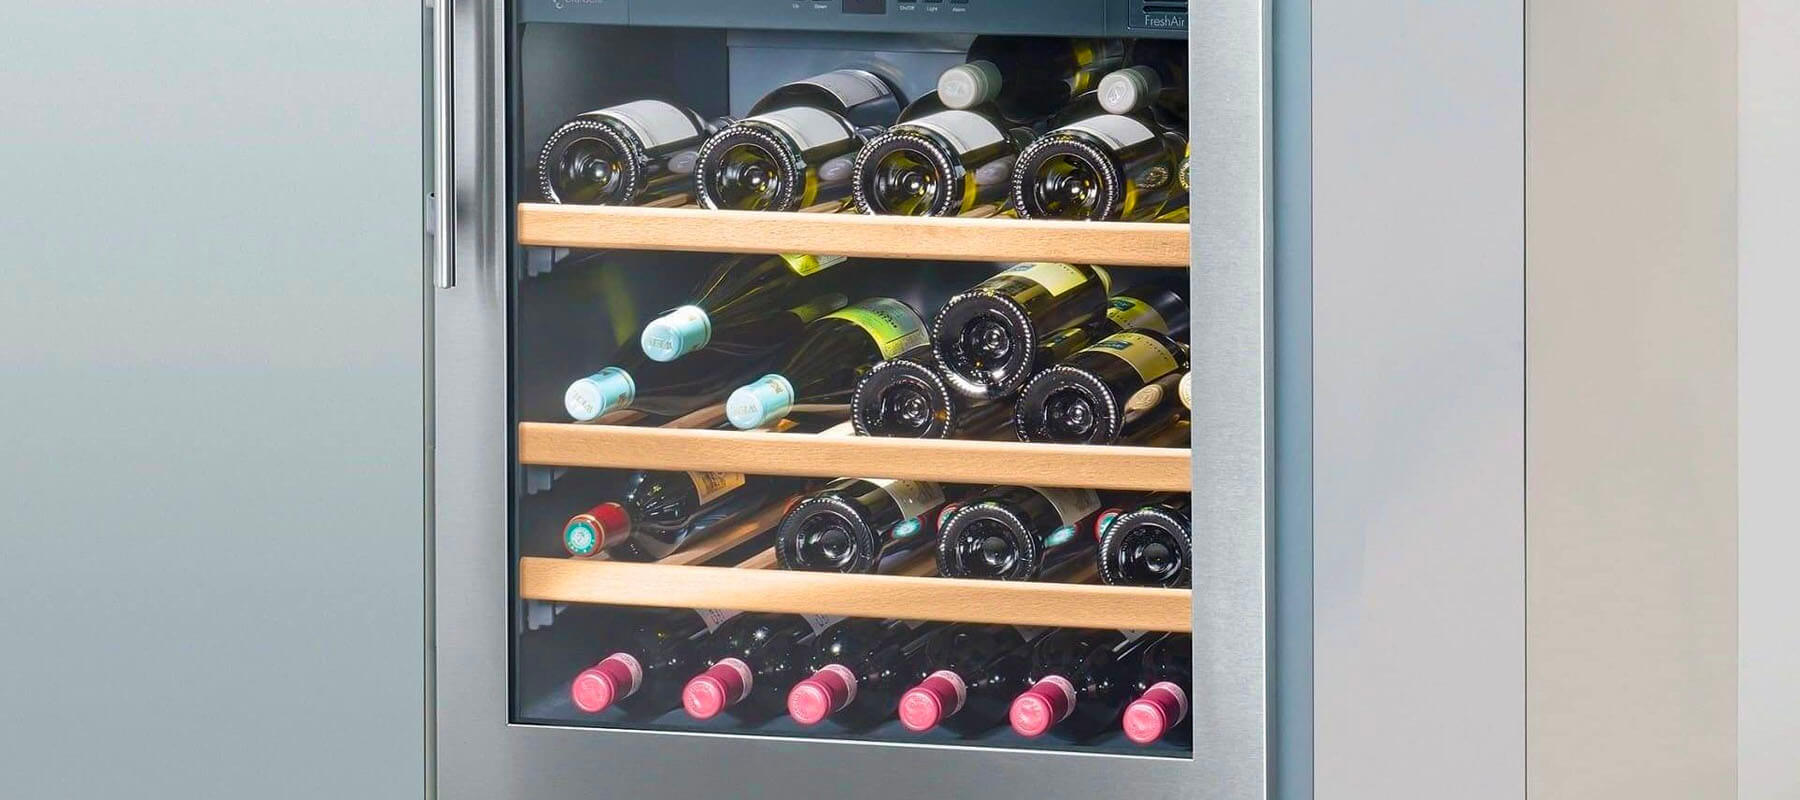 Built in Wine Refrigerator Undercounter Pacific Palisades | Built-in Refrigerator Repair